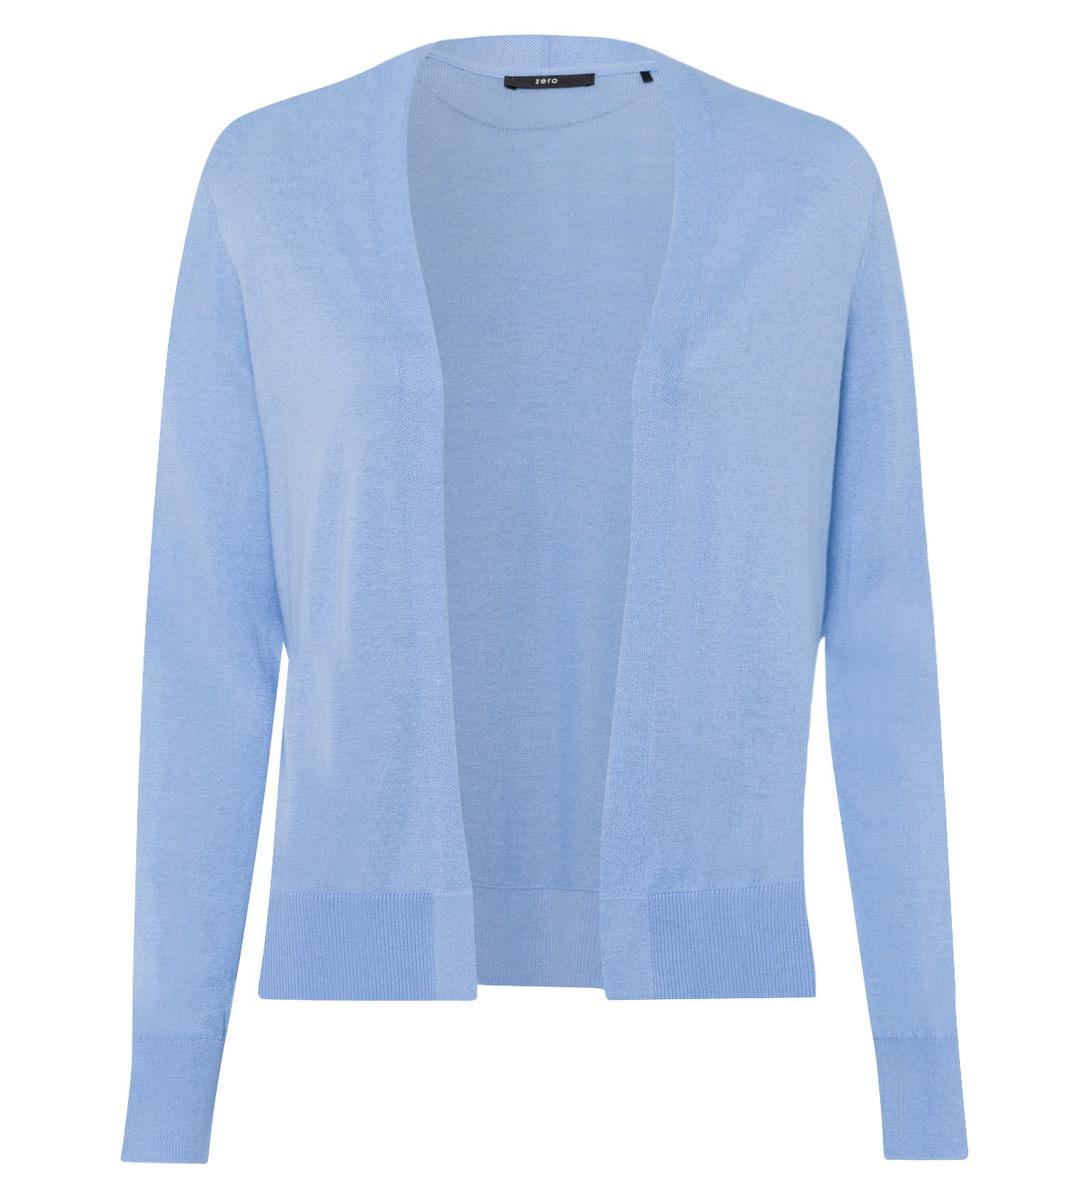 Cardigan in knopflosem Design in blue wave